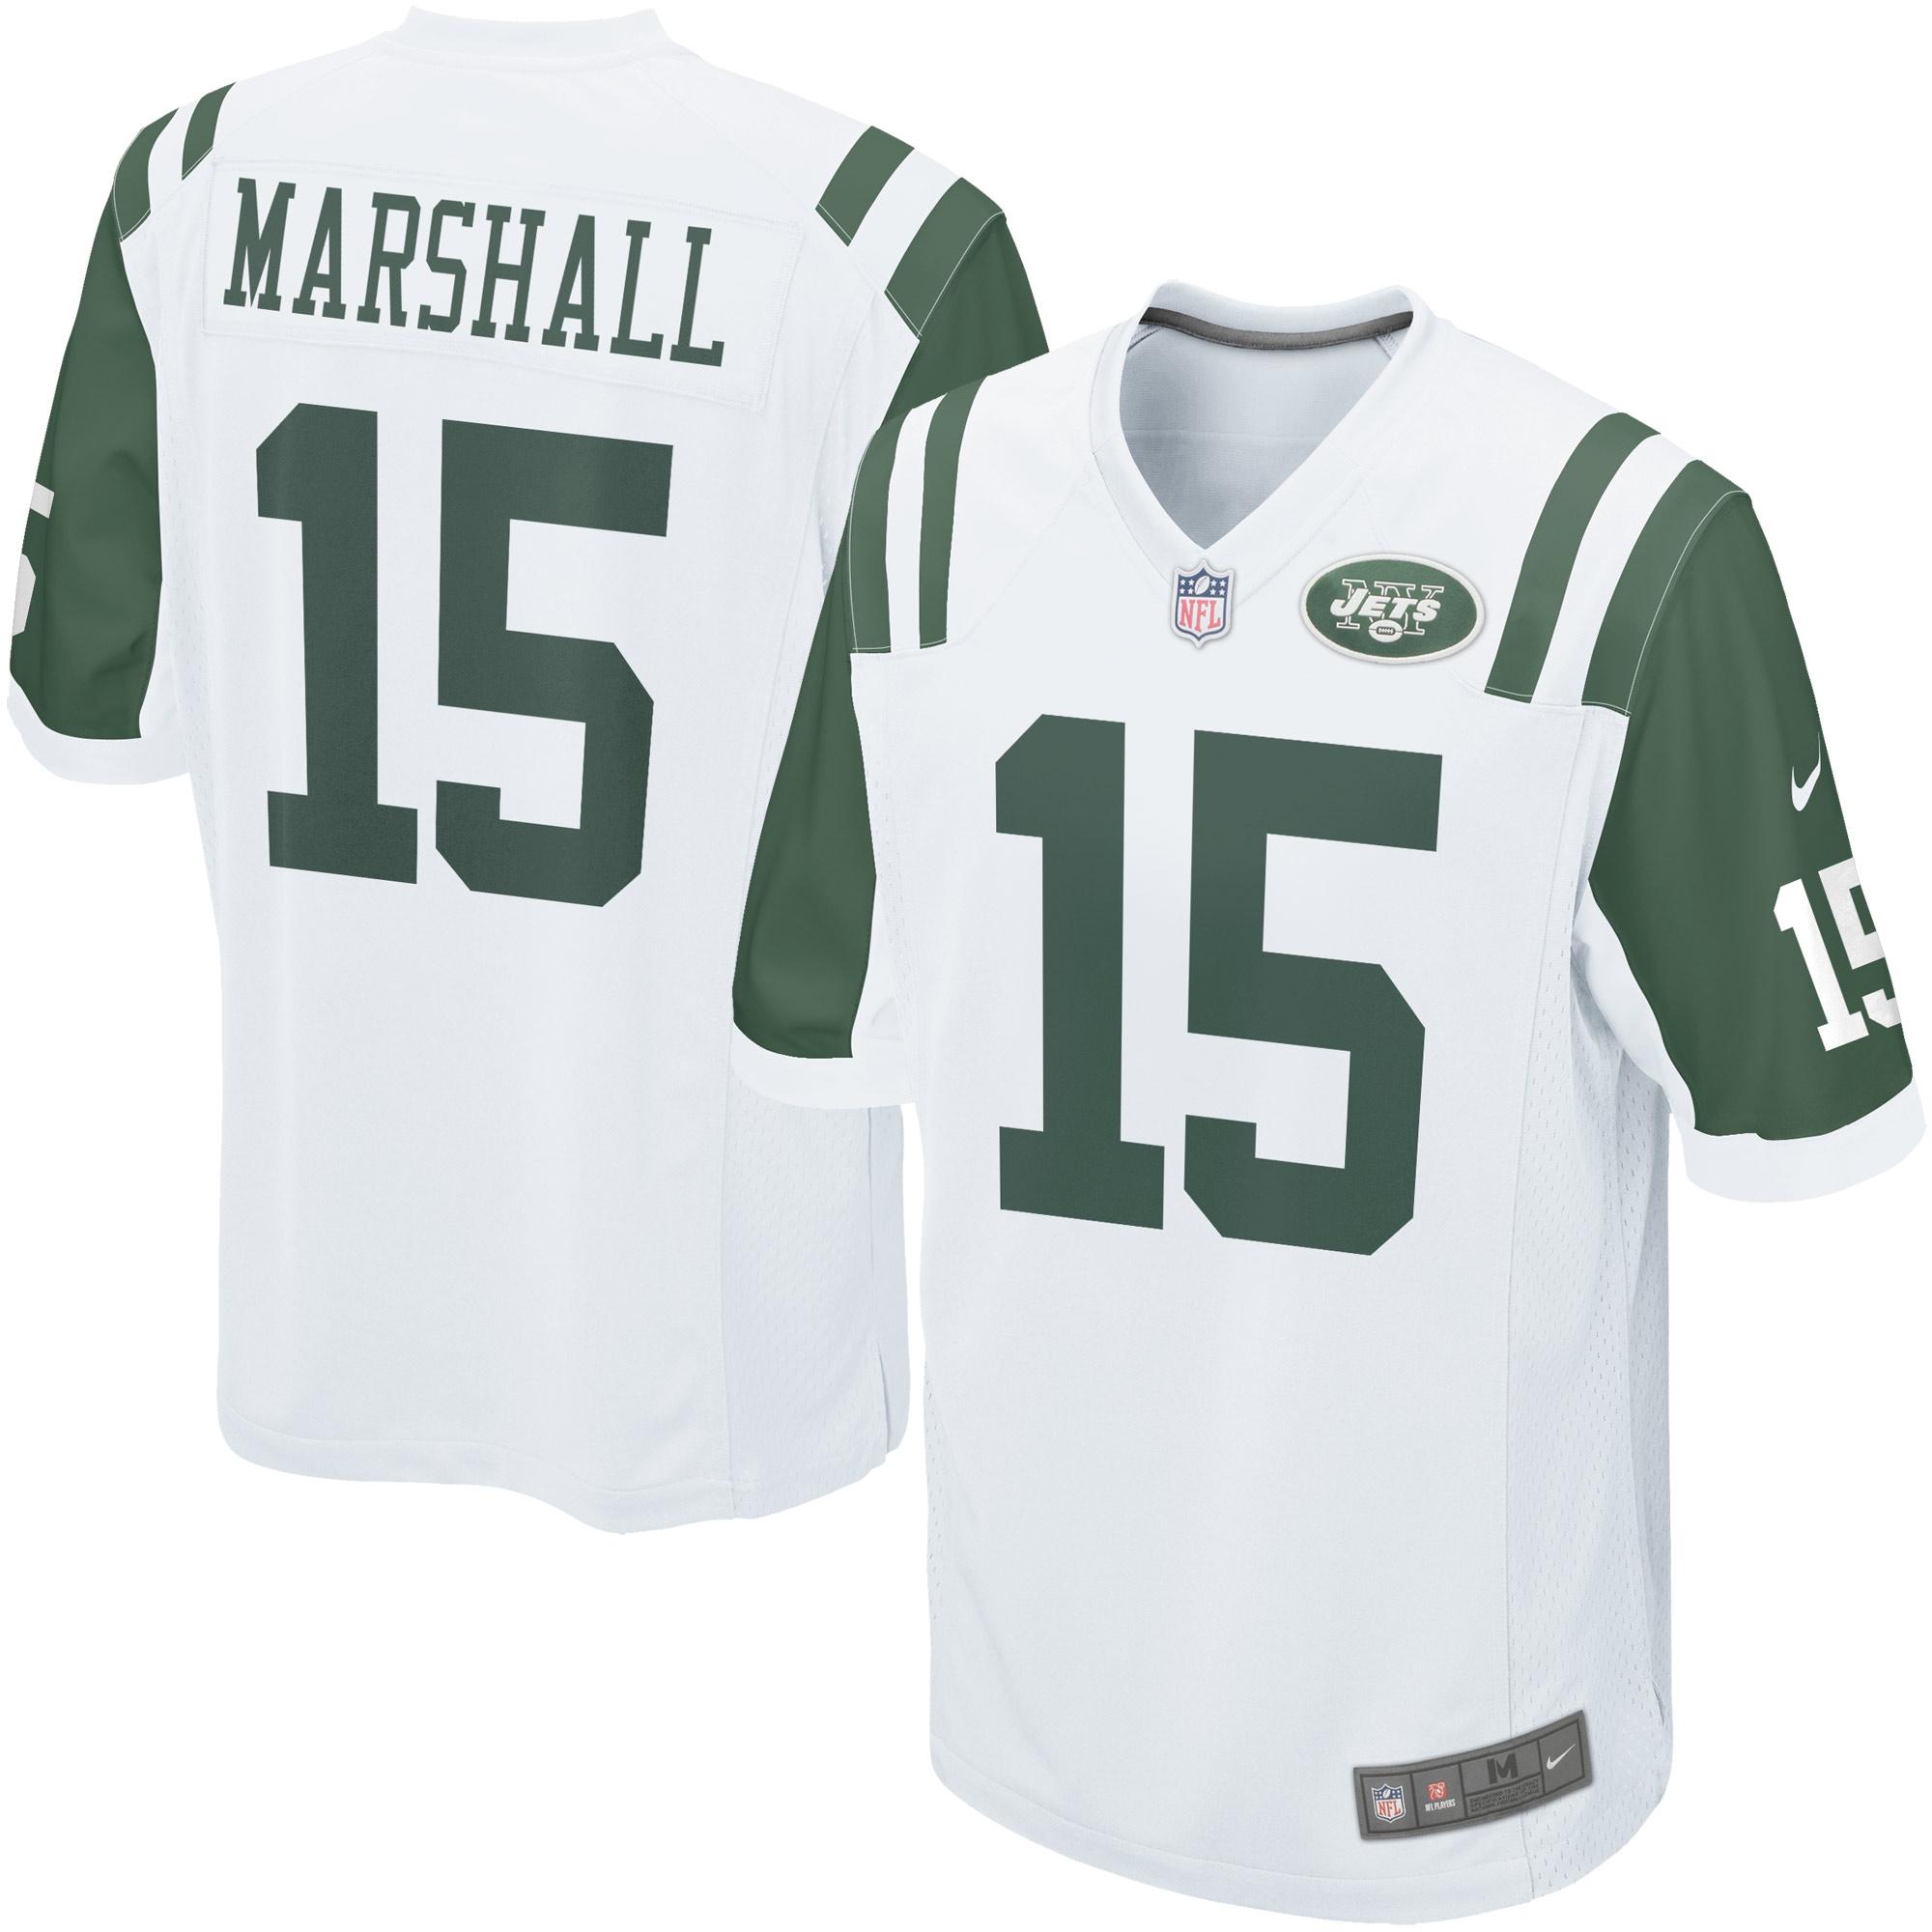 6f0c690b Brandon Marshall New York Jets Nike Game Jersey - White - Walmart.com